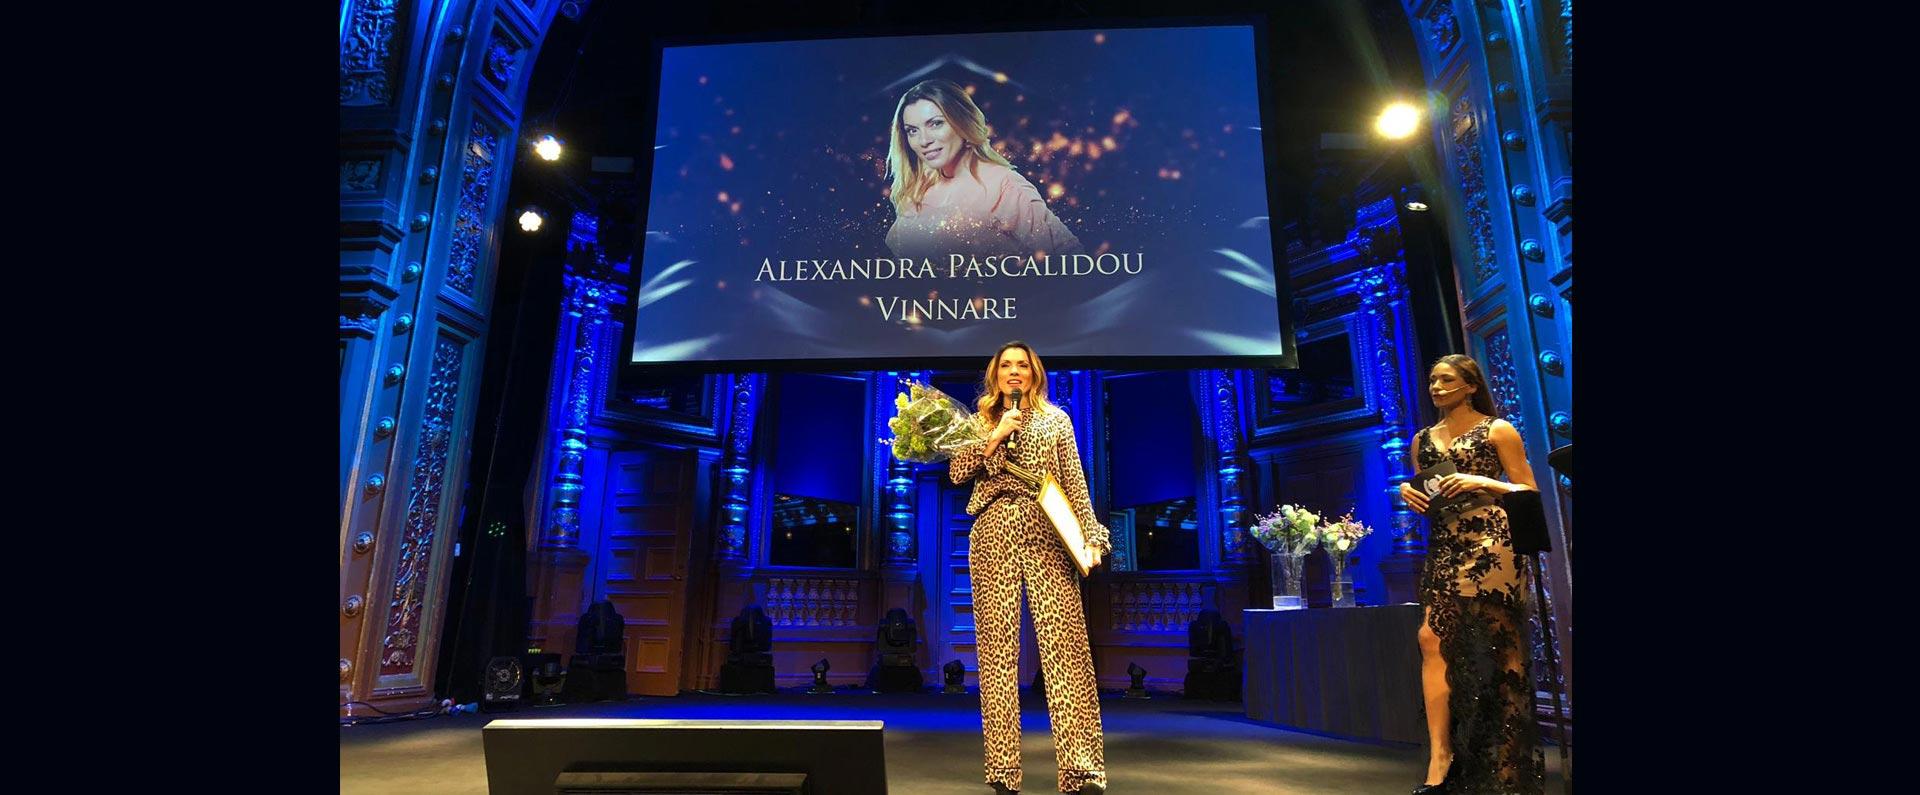 Alexandra Pascalidou vinnare